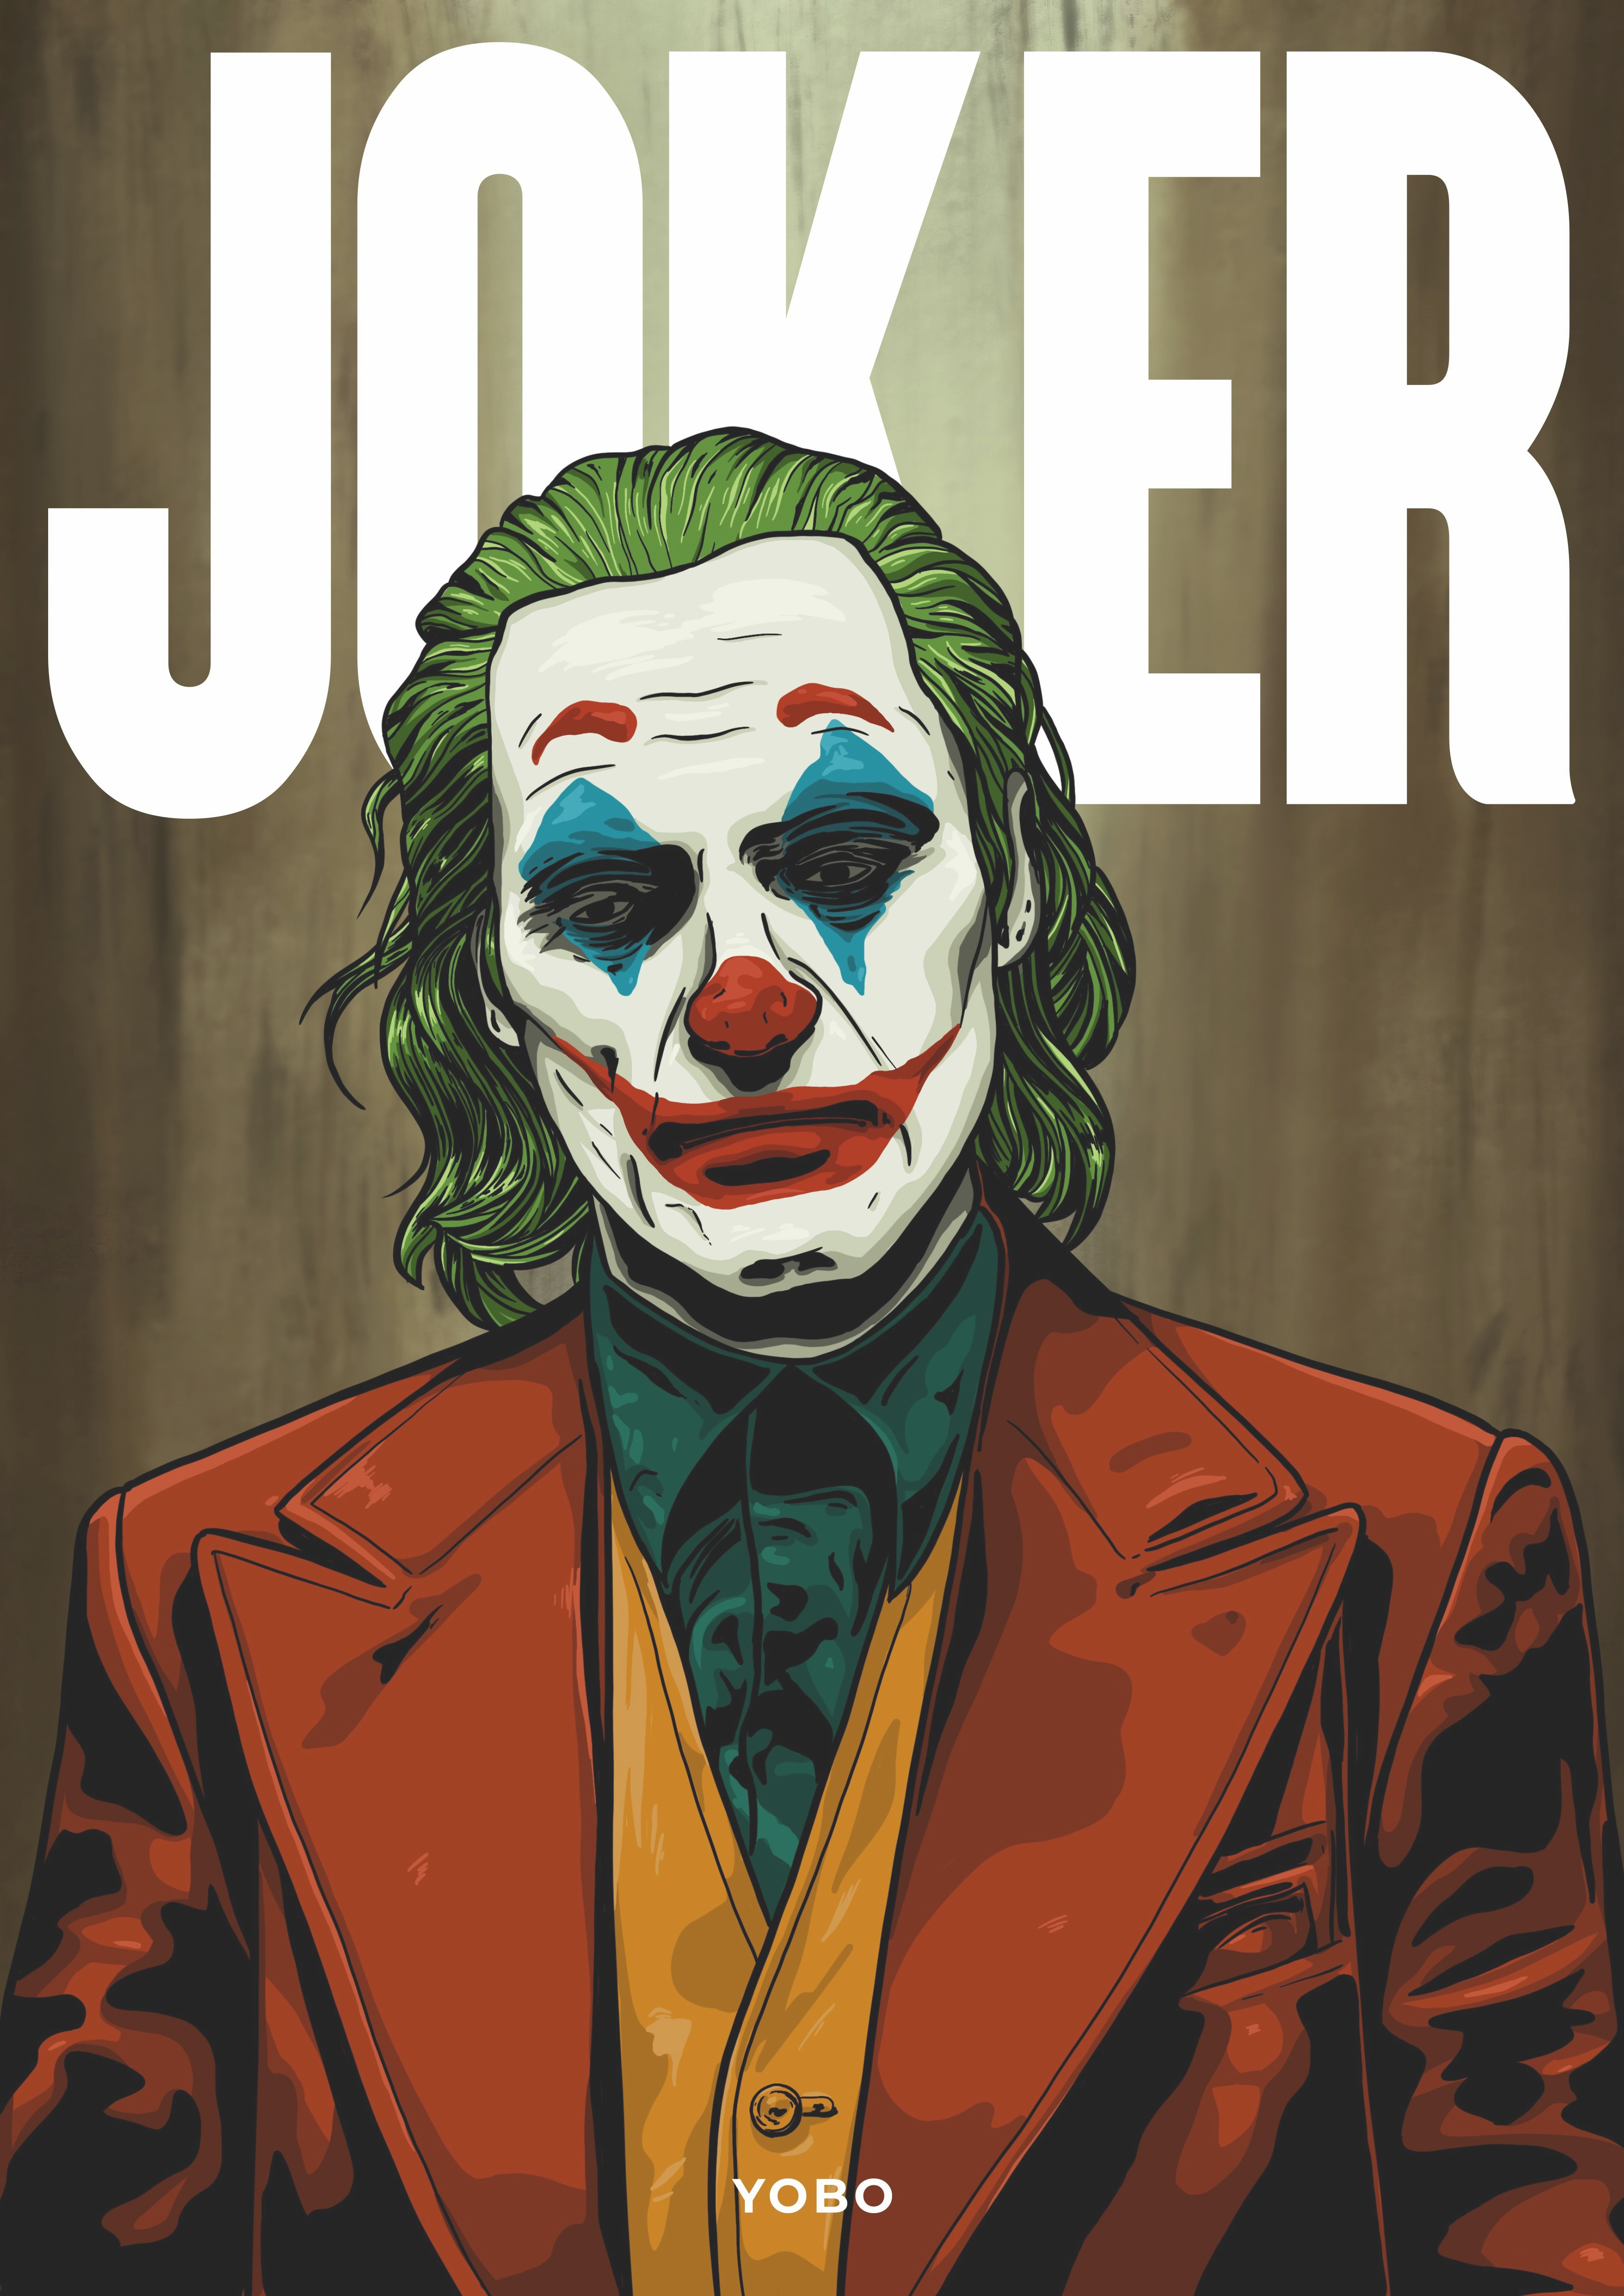 Fotos De Bromista In 2020 Joker Poster Batman Joker Wallpaper Joker Comic